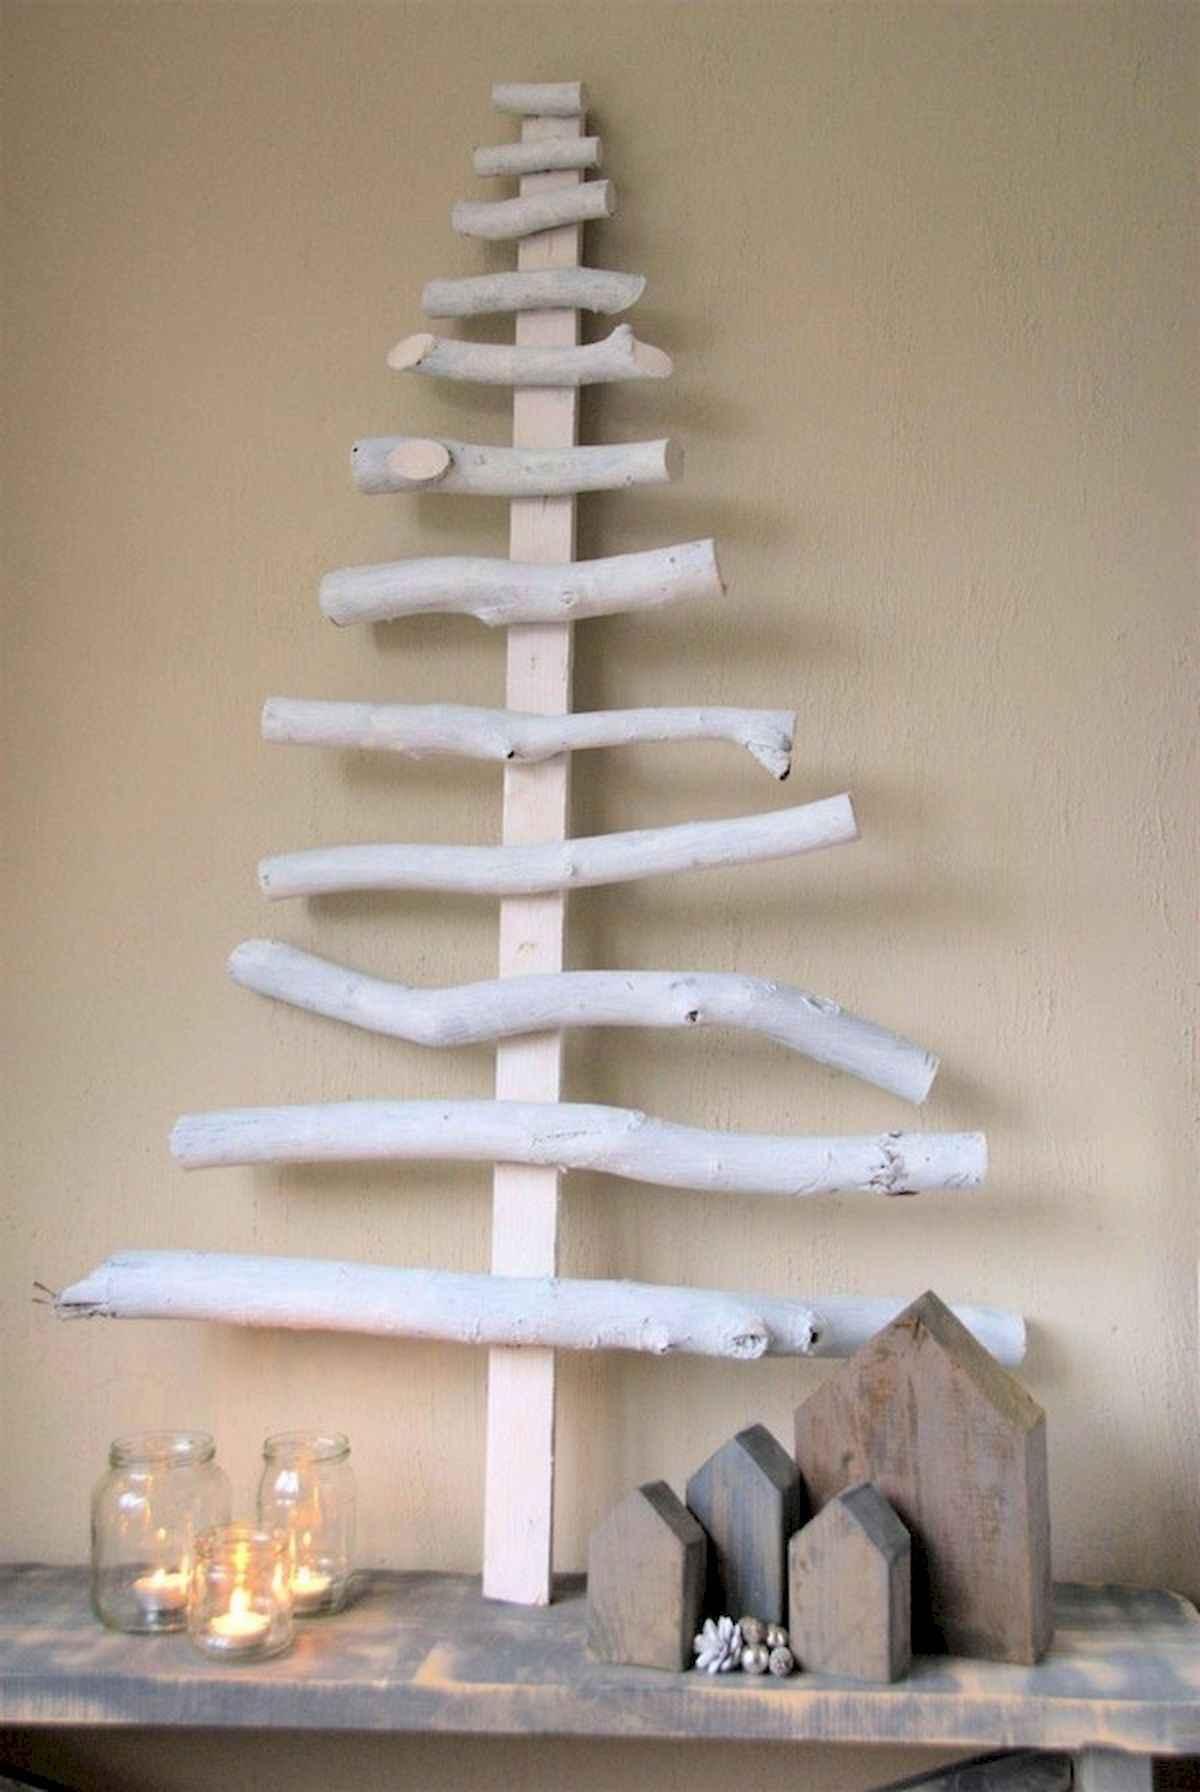 50 diy christmas decorations ideas (40)